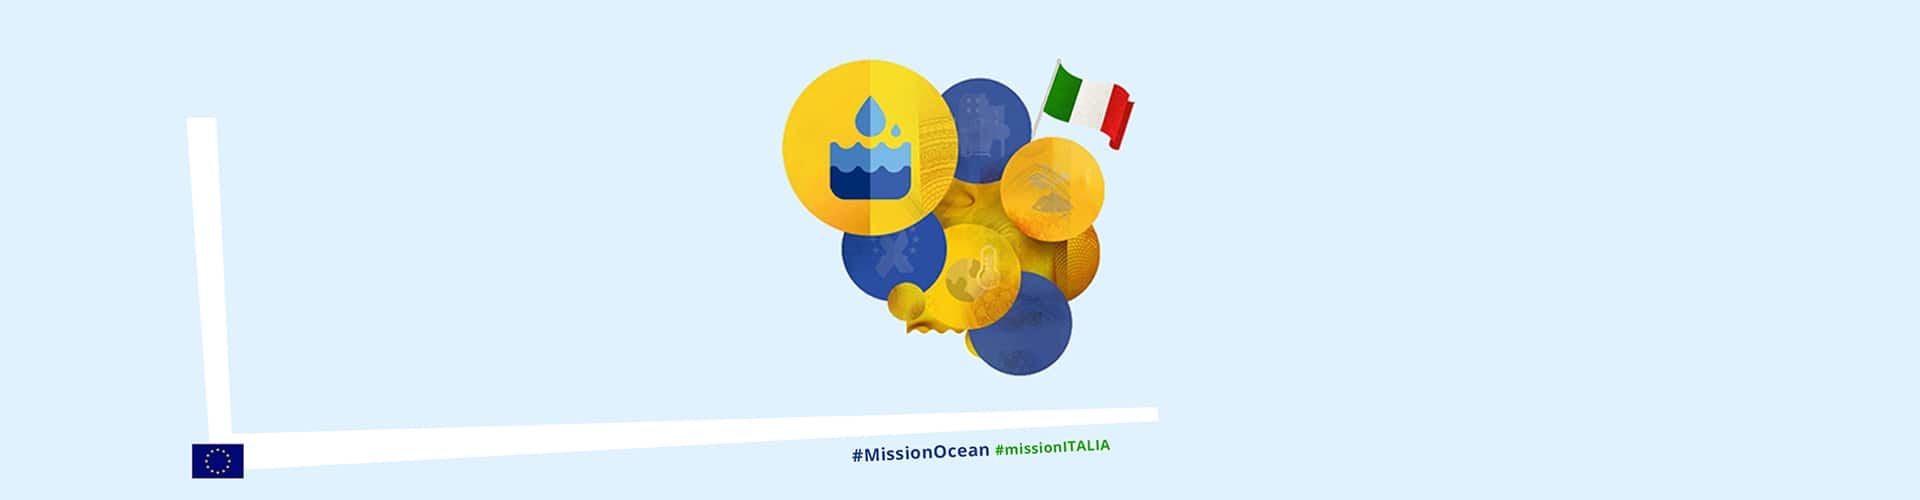 Mission Ocean